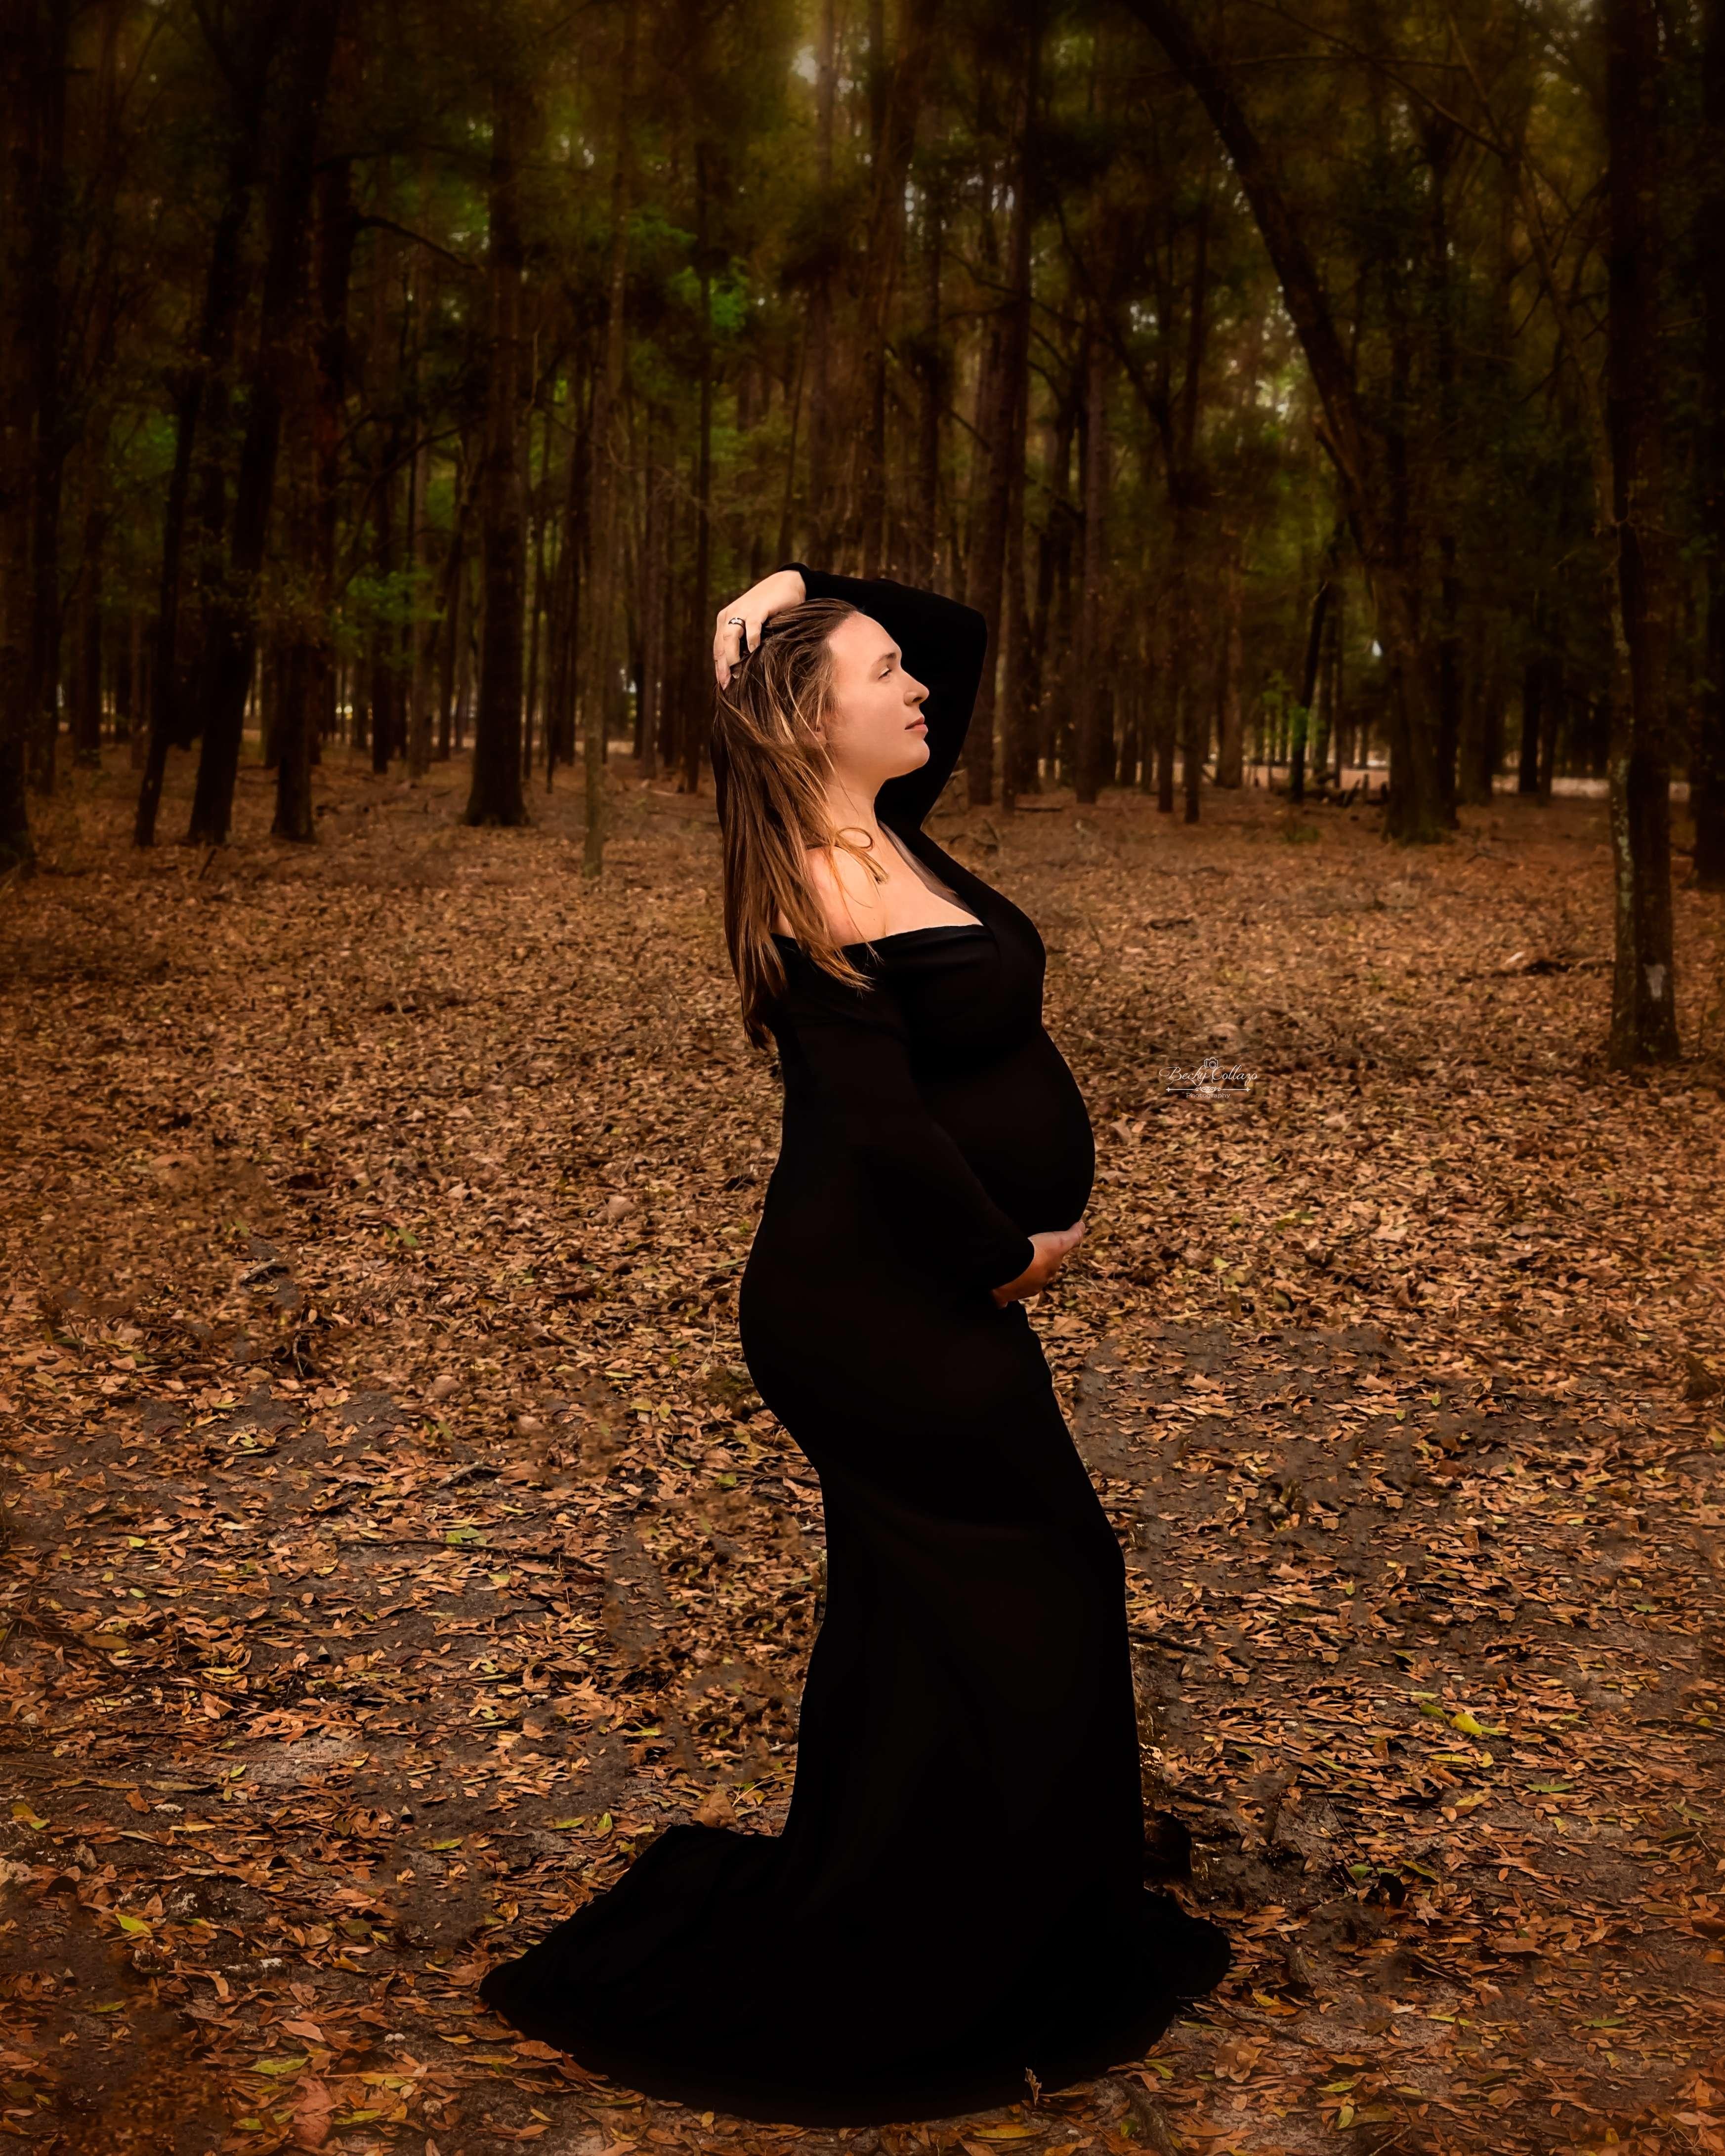 Ocala FL, Becky Collazo Photography, Maternity photography